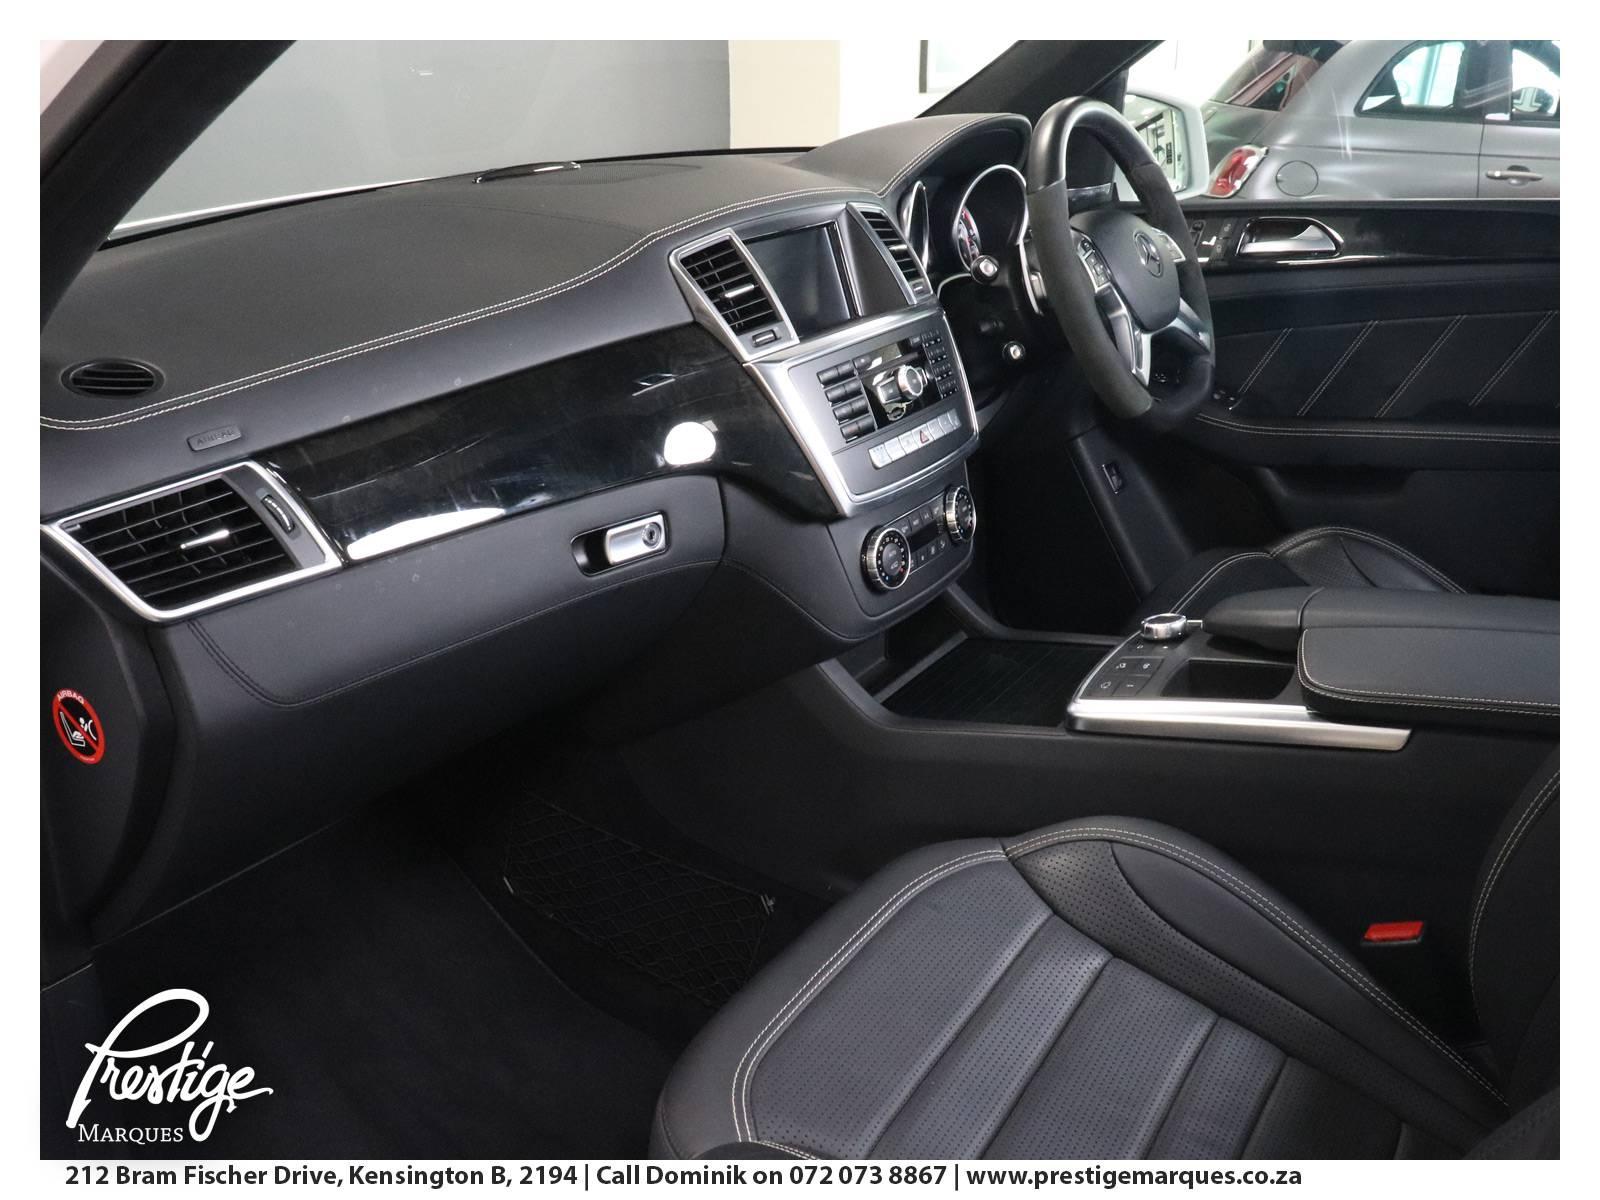 2015-Mercedes-Benz-ML63-AMG-Prestige-Marques-Randburg-Sandton-12